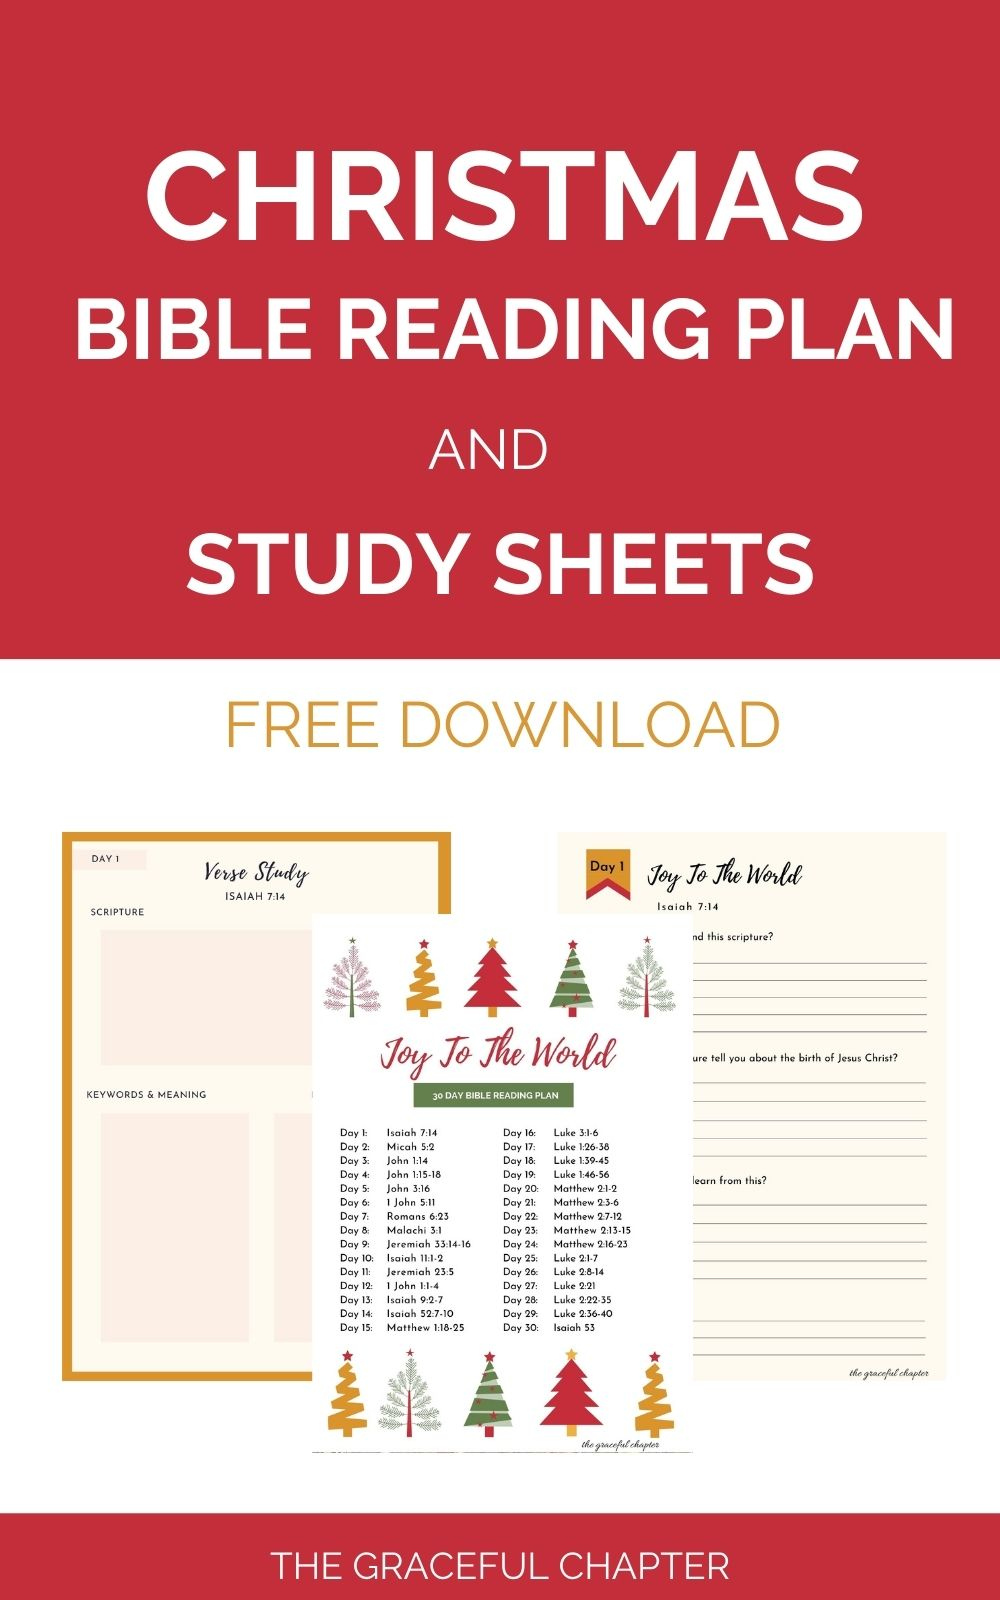 Christmas bible reading plan and study sheets